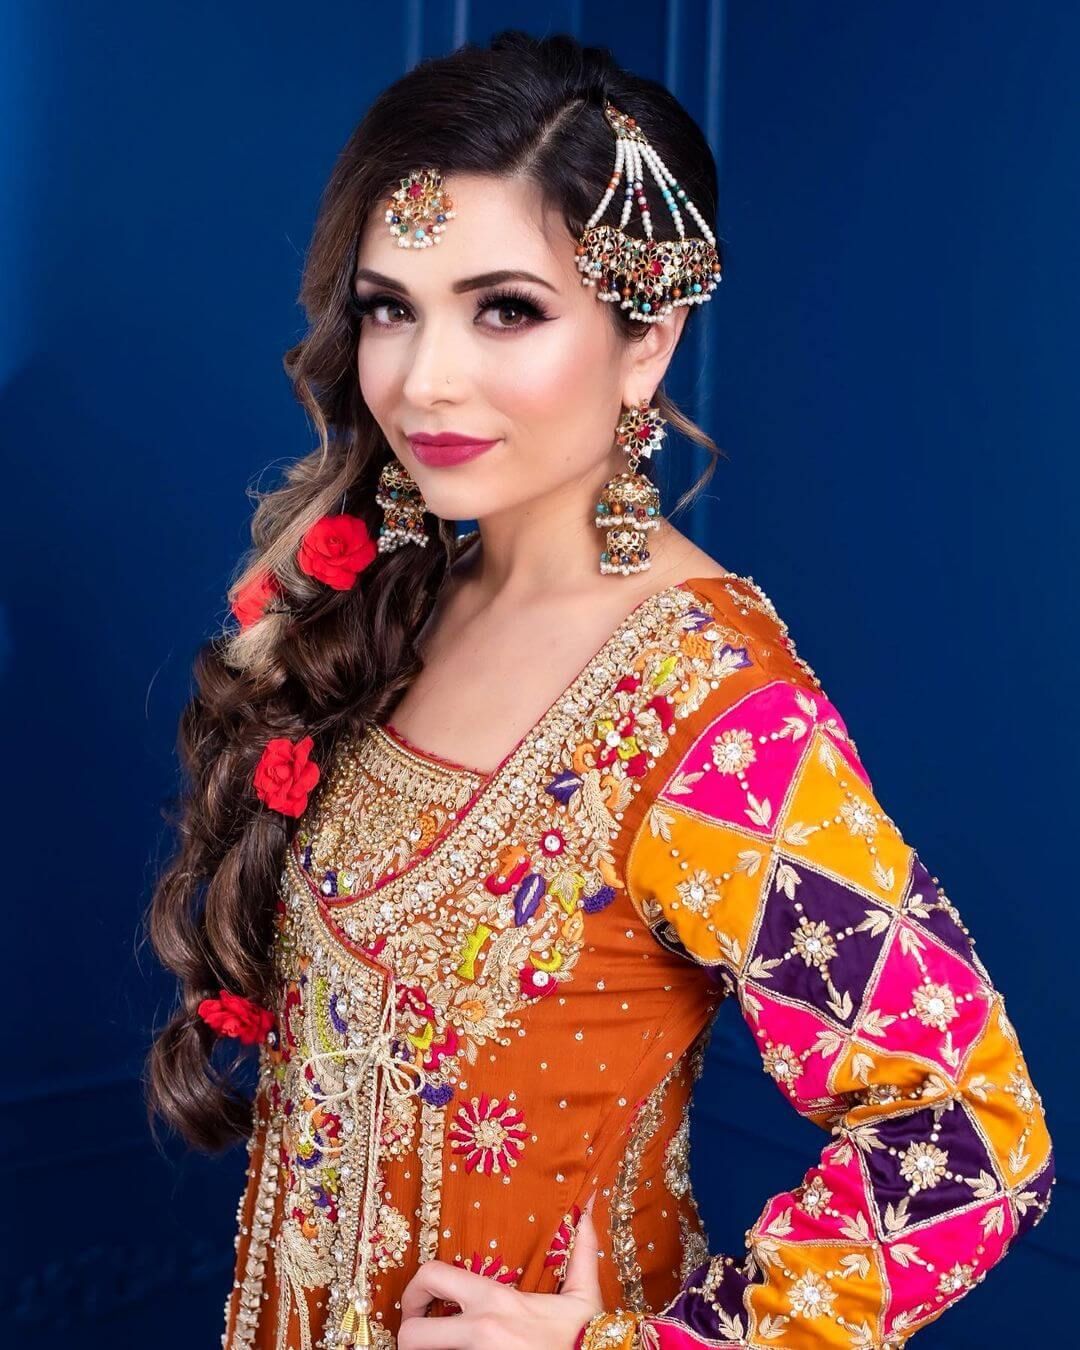 Colorful Beaded Passa/Jhoomar Designs For Muslim Bride